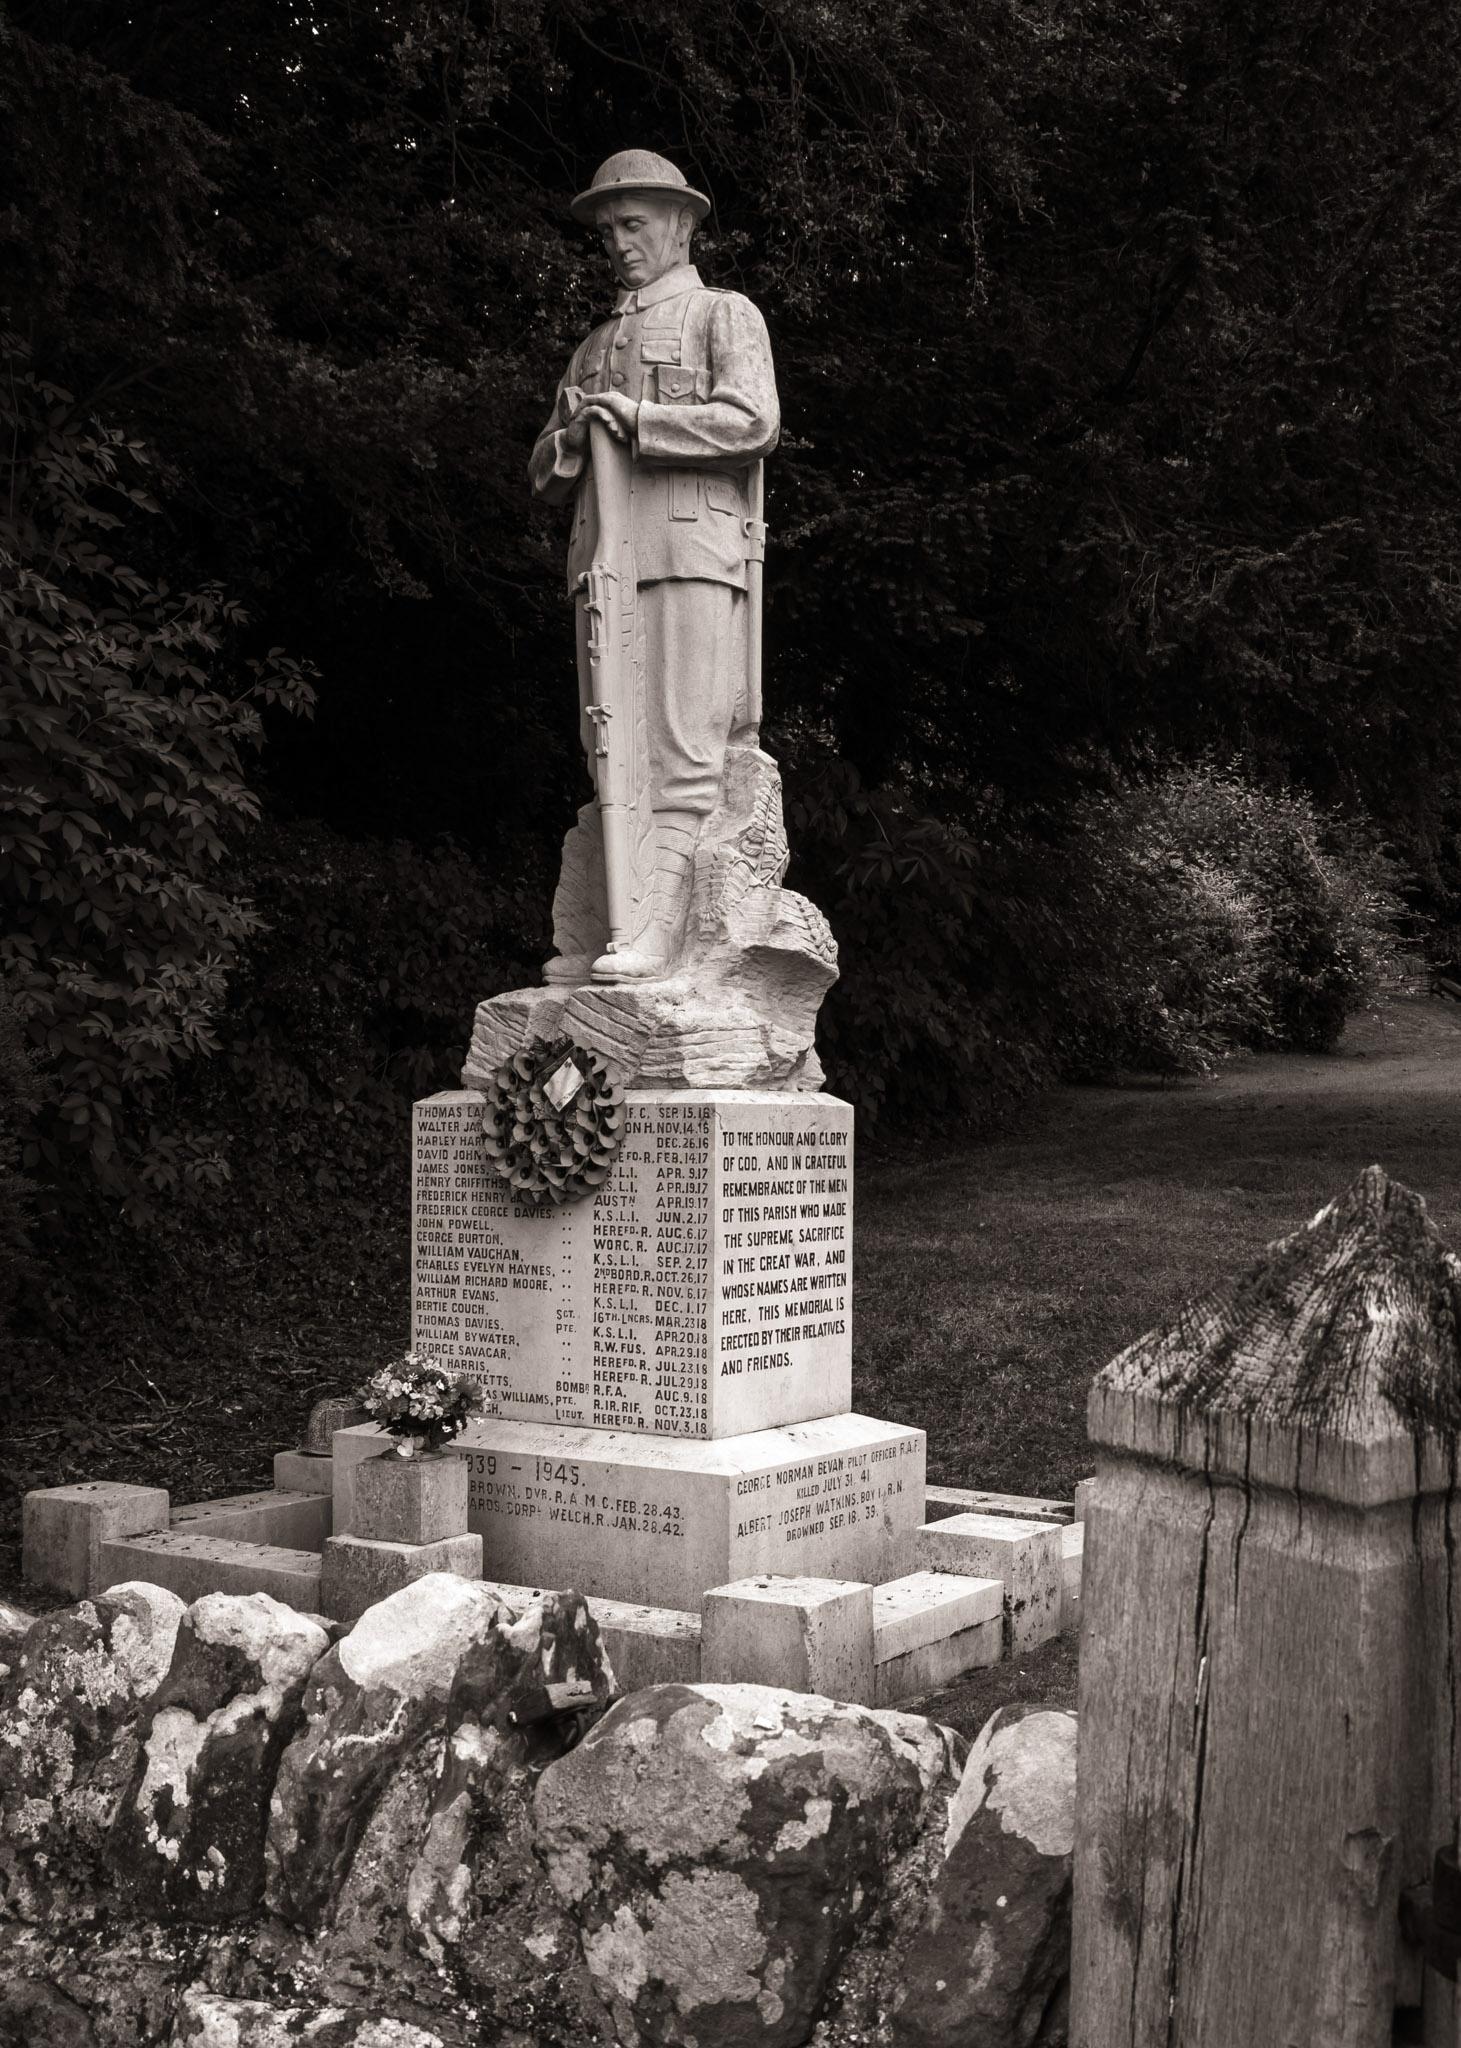 World War I Memorial, Dilwyn, Herefordshire, England